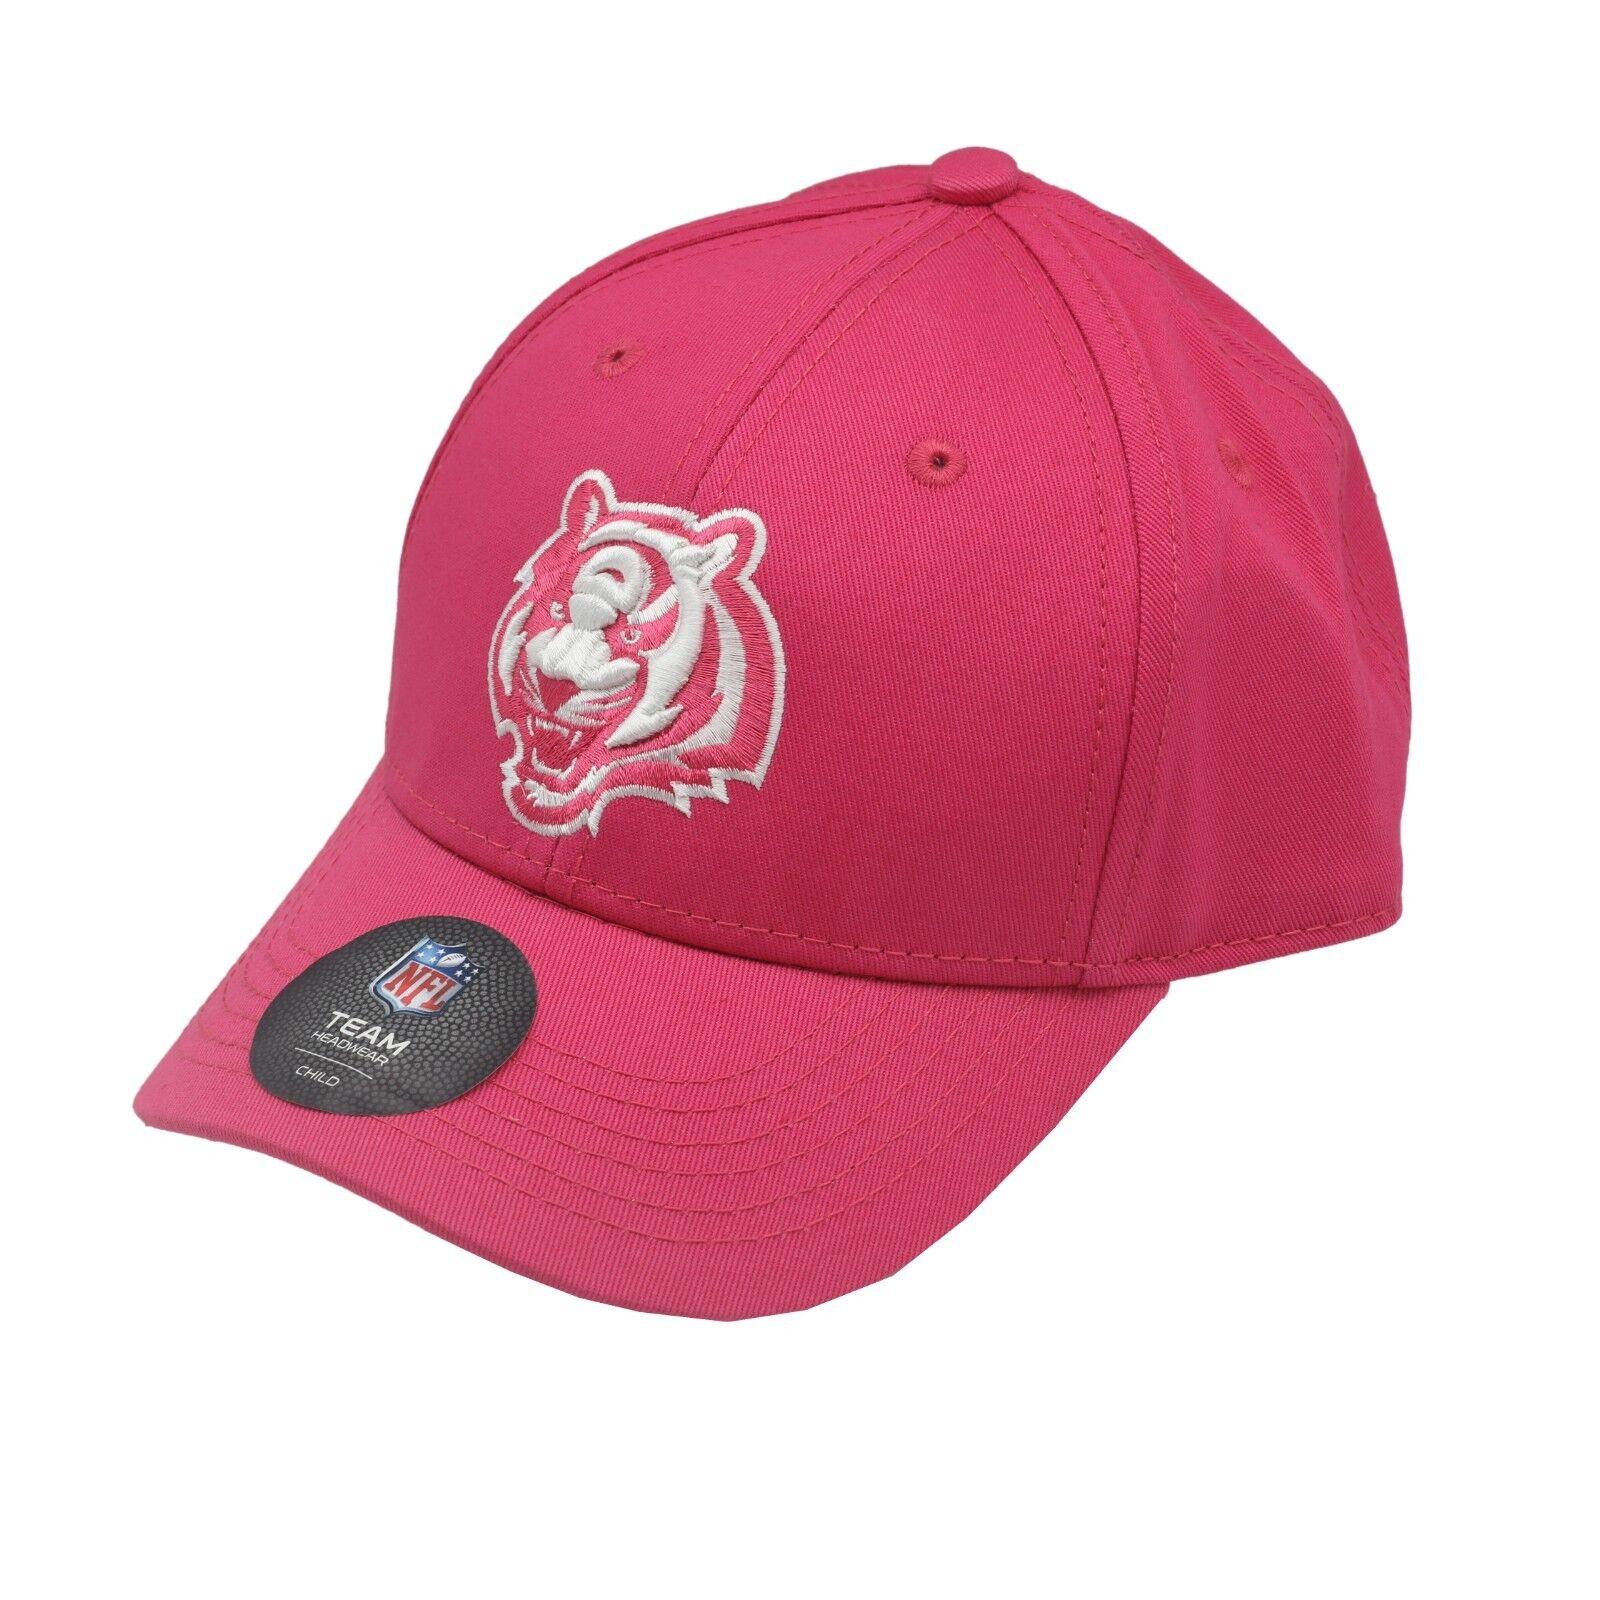 852a1f9b Details about Cincinnati Bengals NFL Apparel Toddler & Kids Girls OSFM  Adjustable Pink Hat Cap